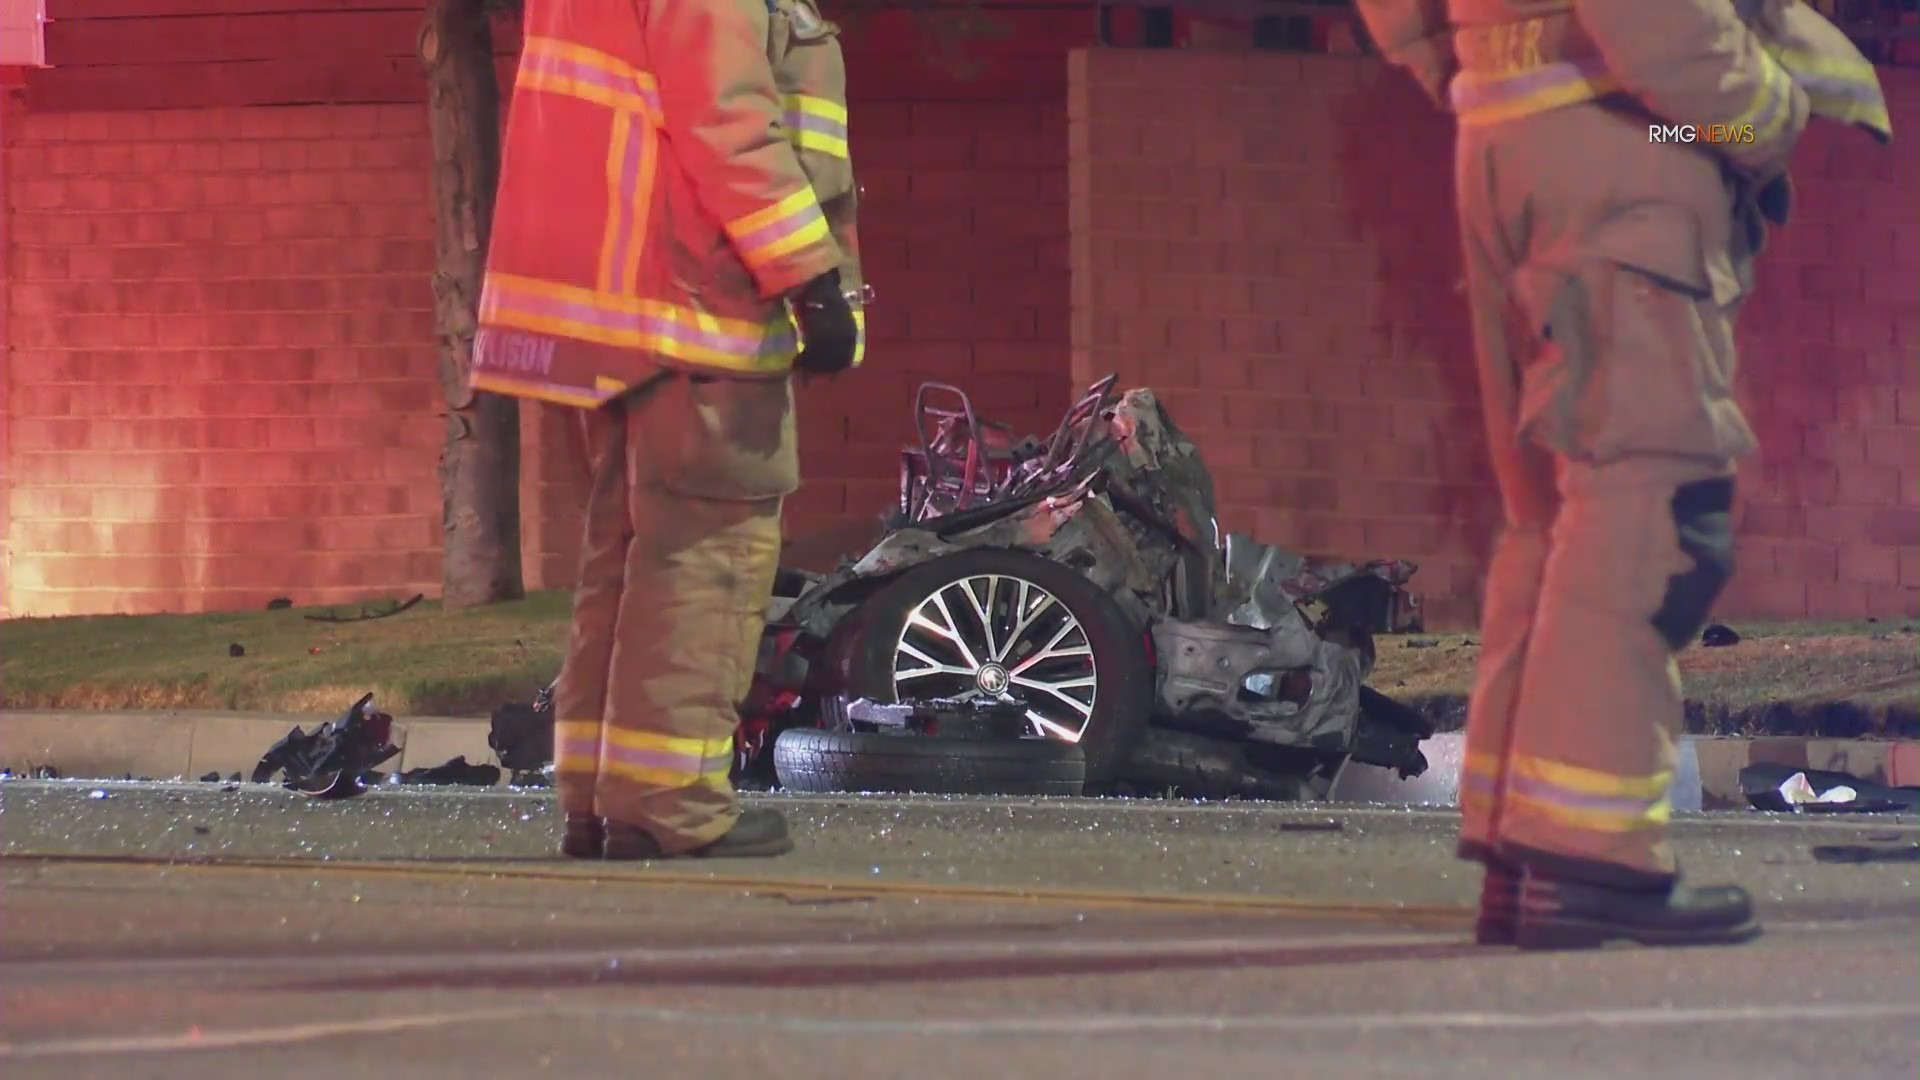 Emergency crews respond to a fatal crash in Burbank on Aug. 3, 2021. (RMG News)